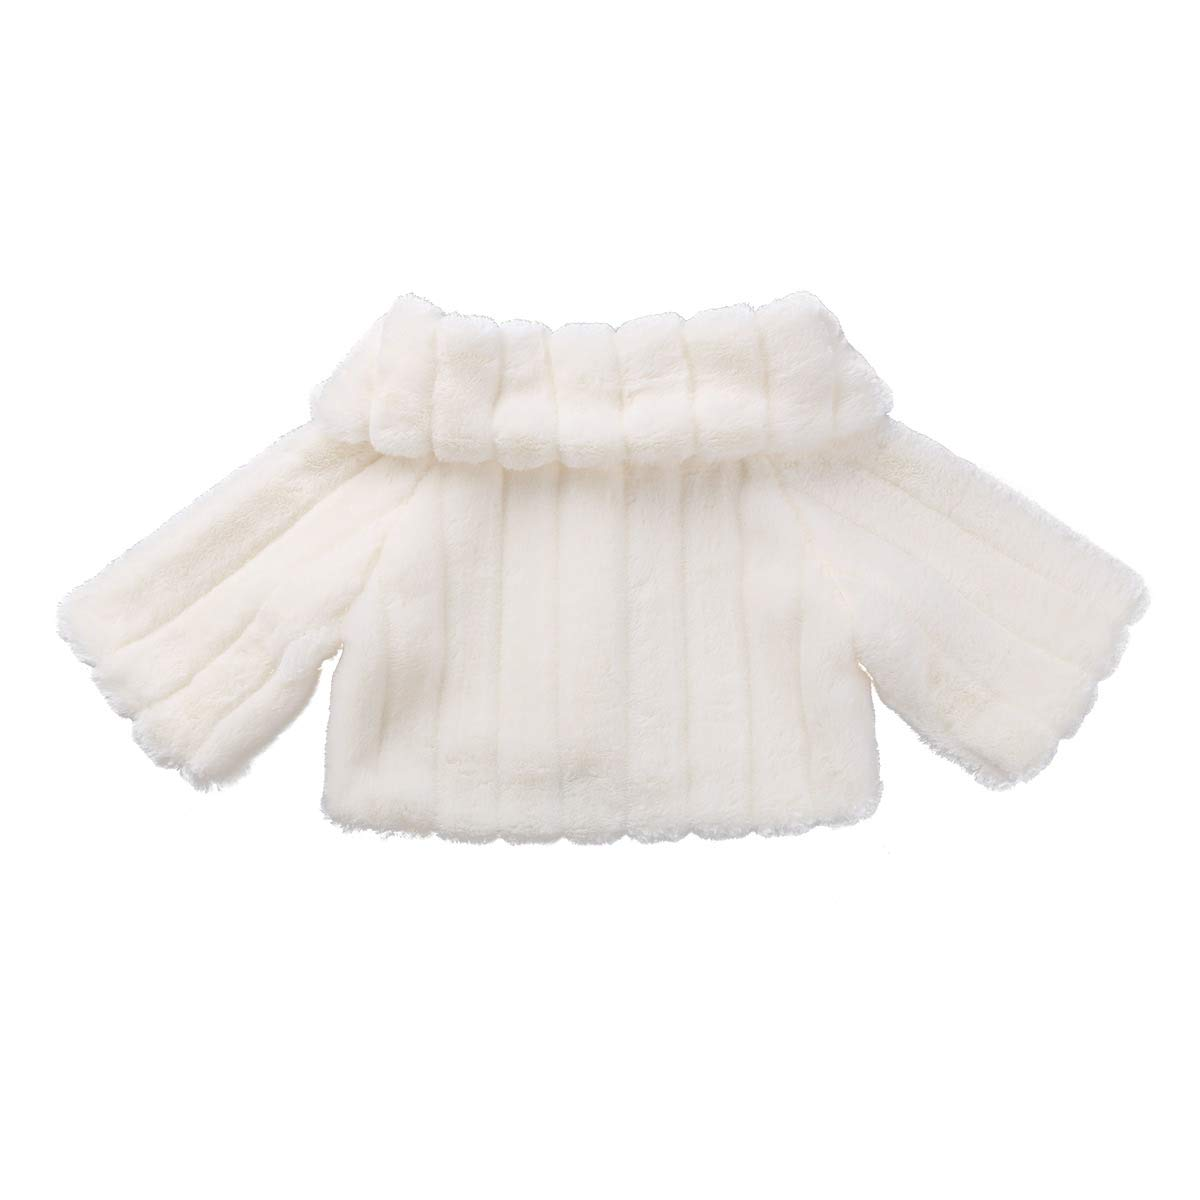 Amazon.com: ACSUSS Little Big Girls Wedding Bridesmaid Faux Fur Shawl Wraps Bolero Flower Dress Cover Up: Clothing